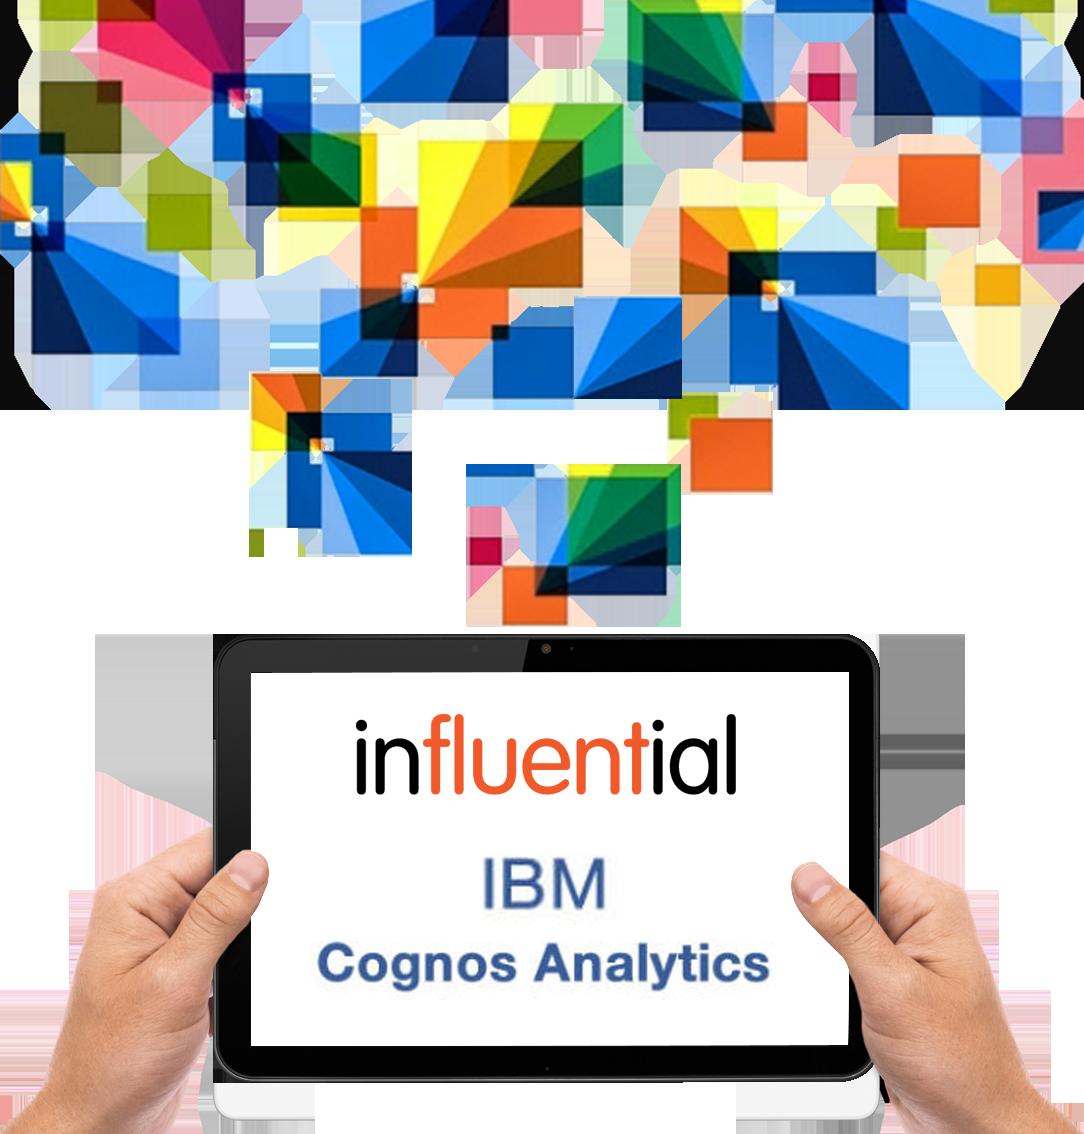 influential-tablet-ibm-cognos-analytics